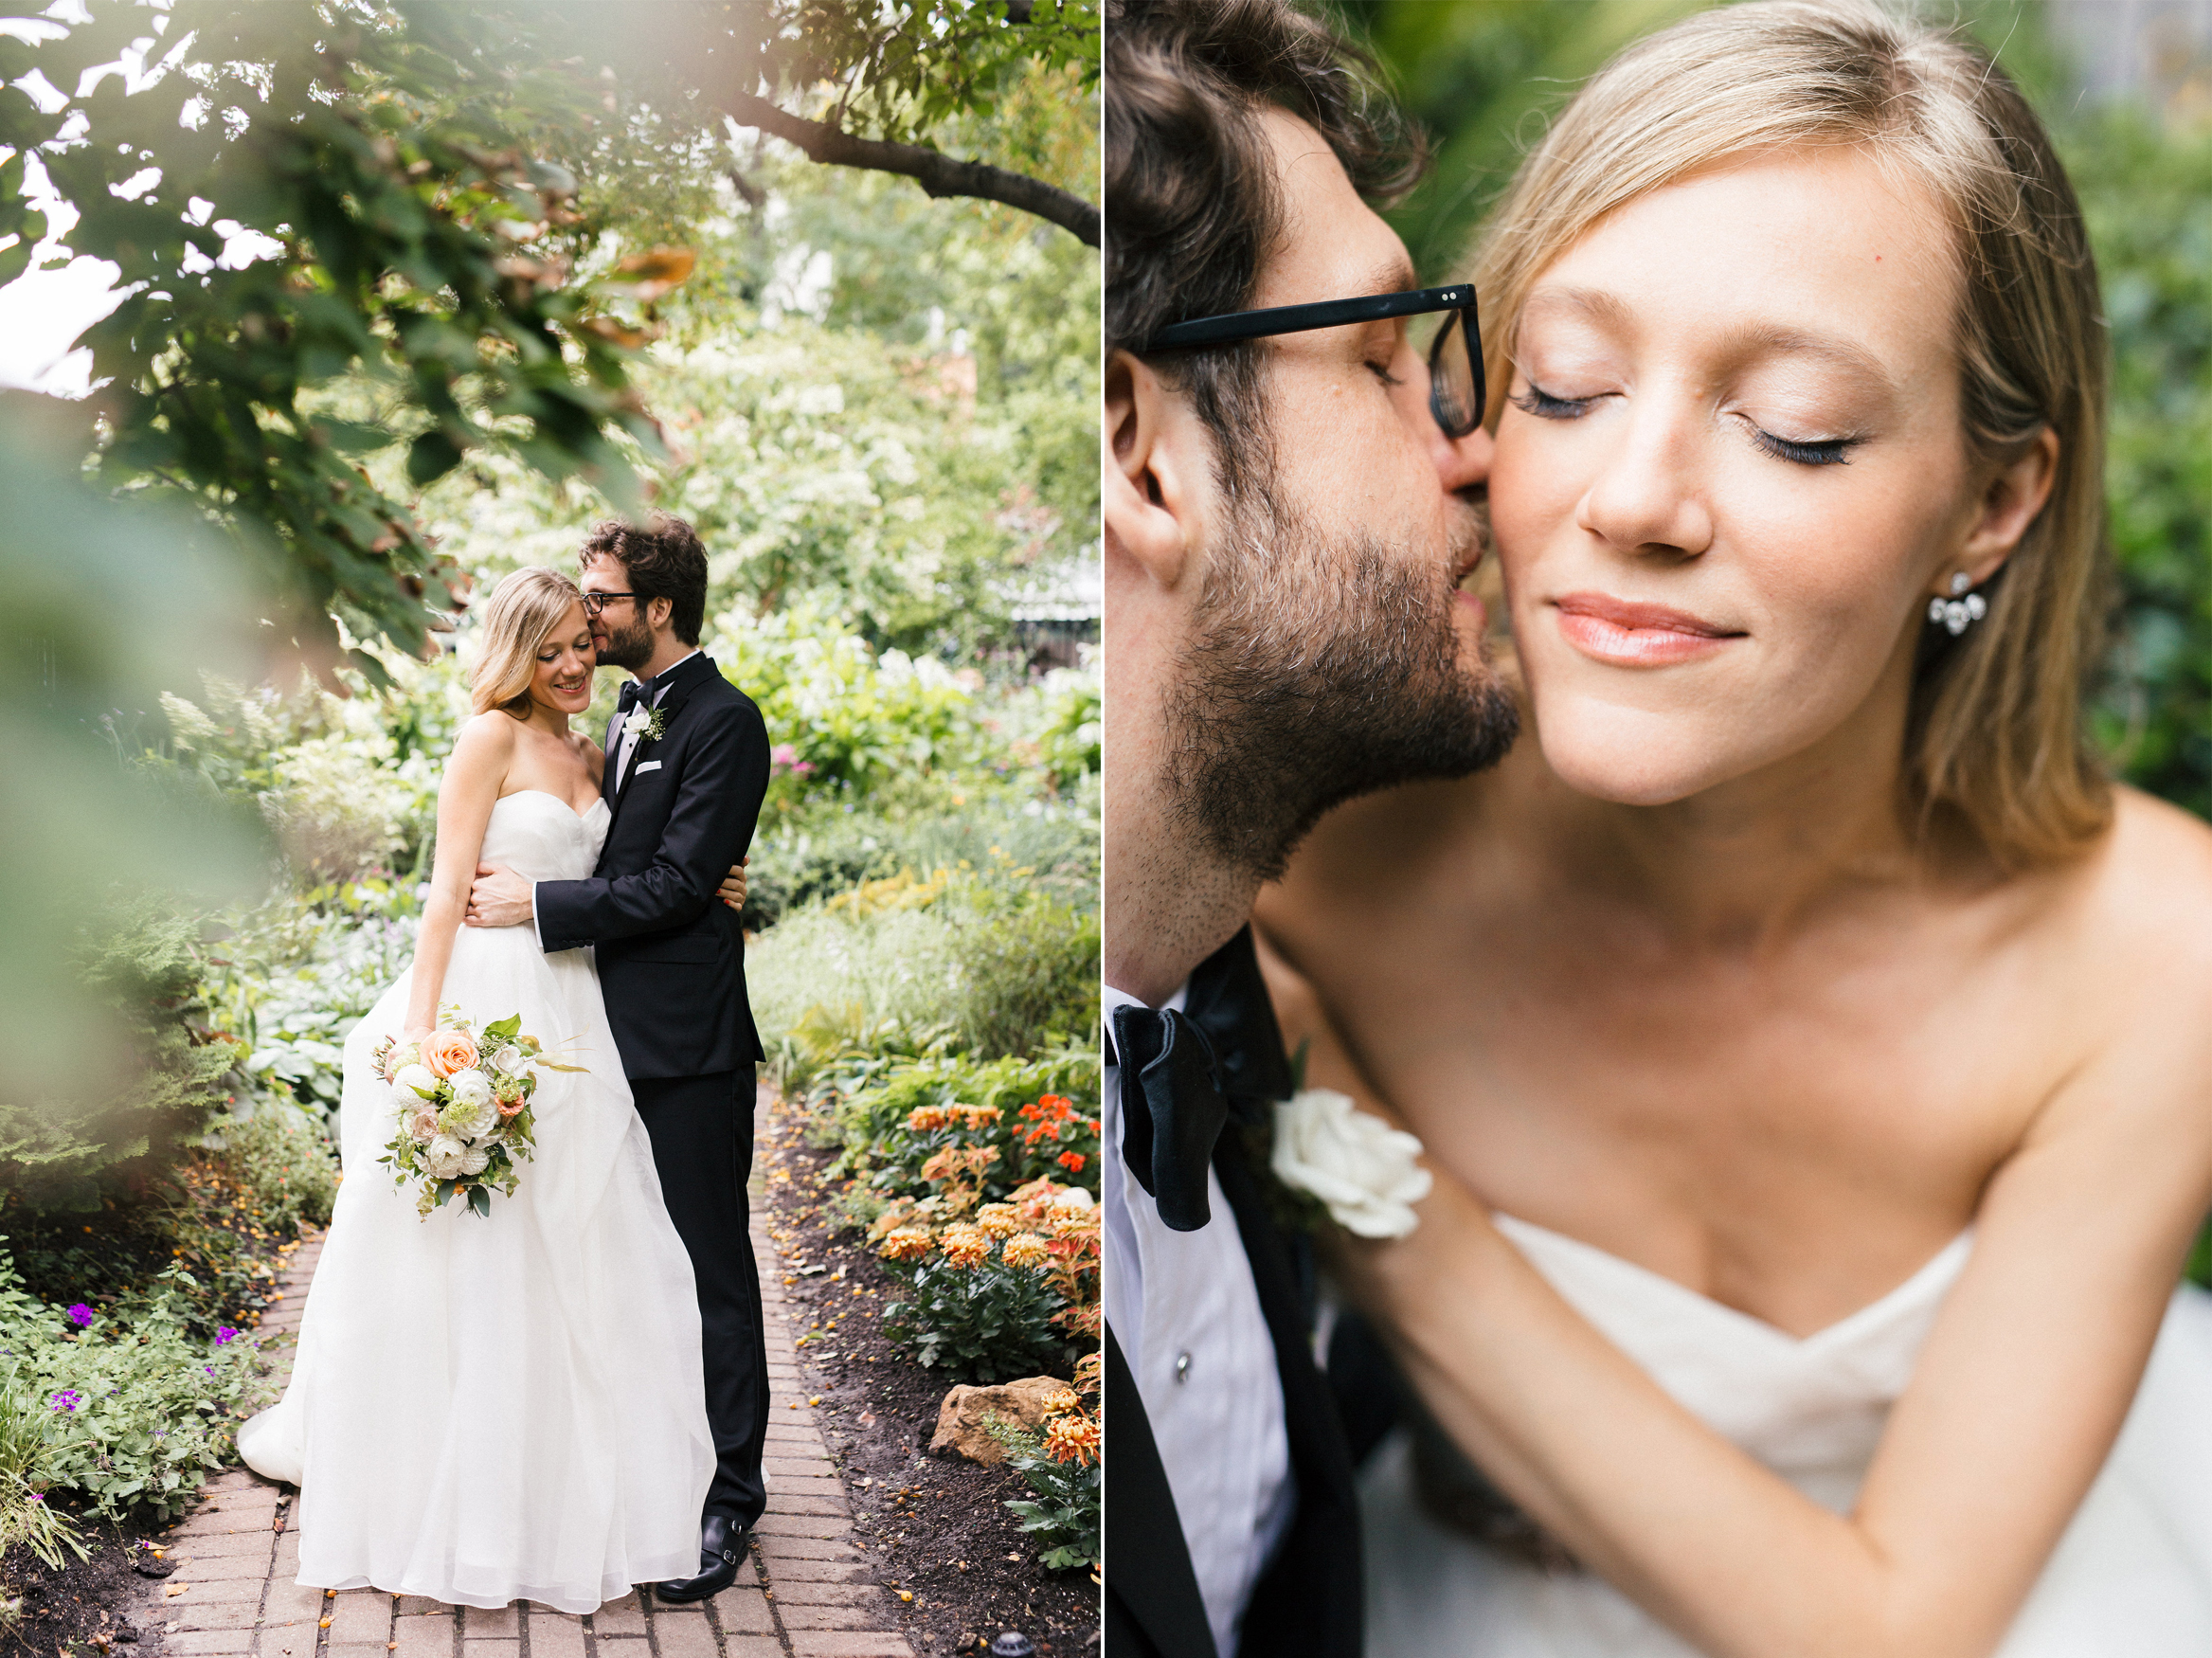 Kiss in the Park Soho Wedding